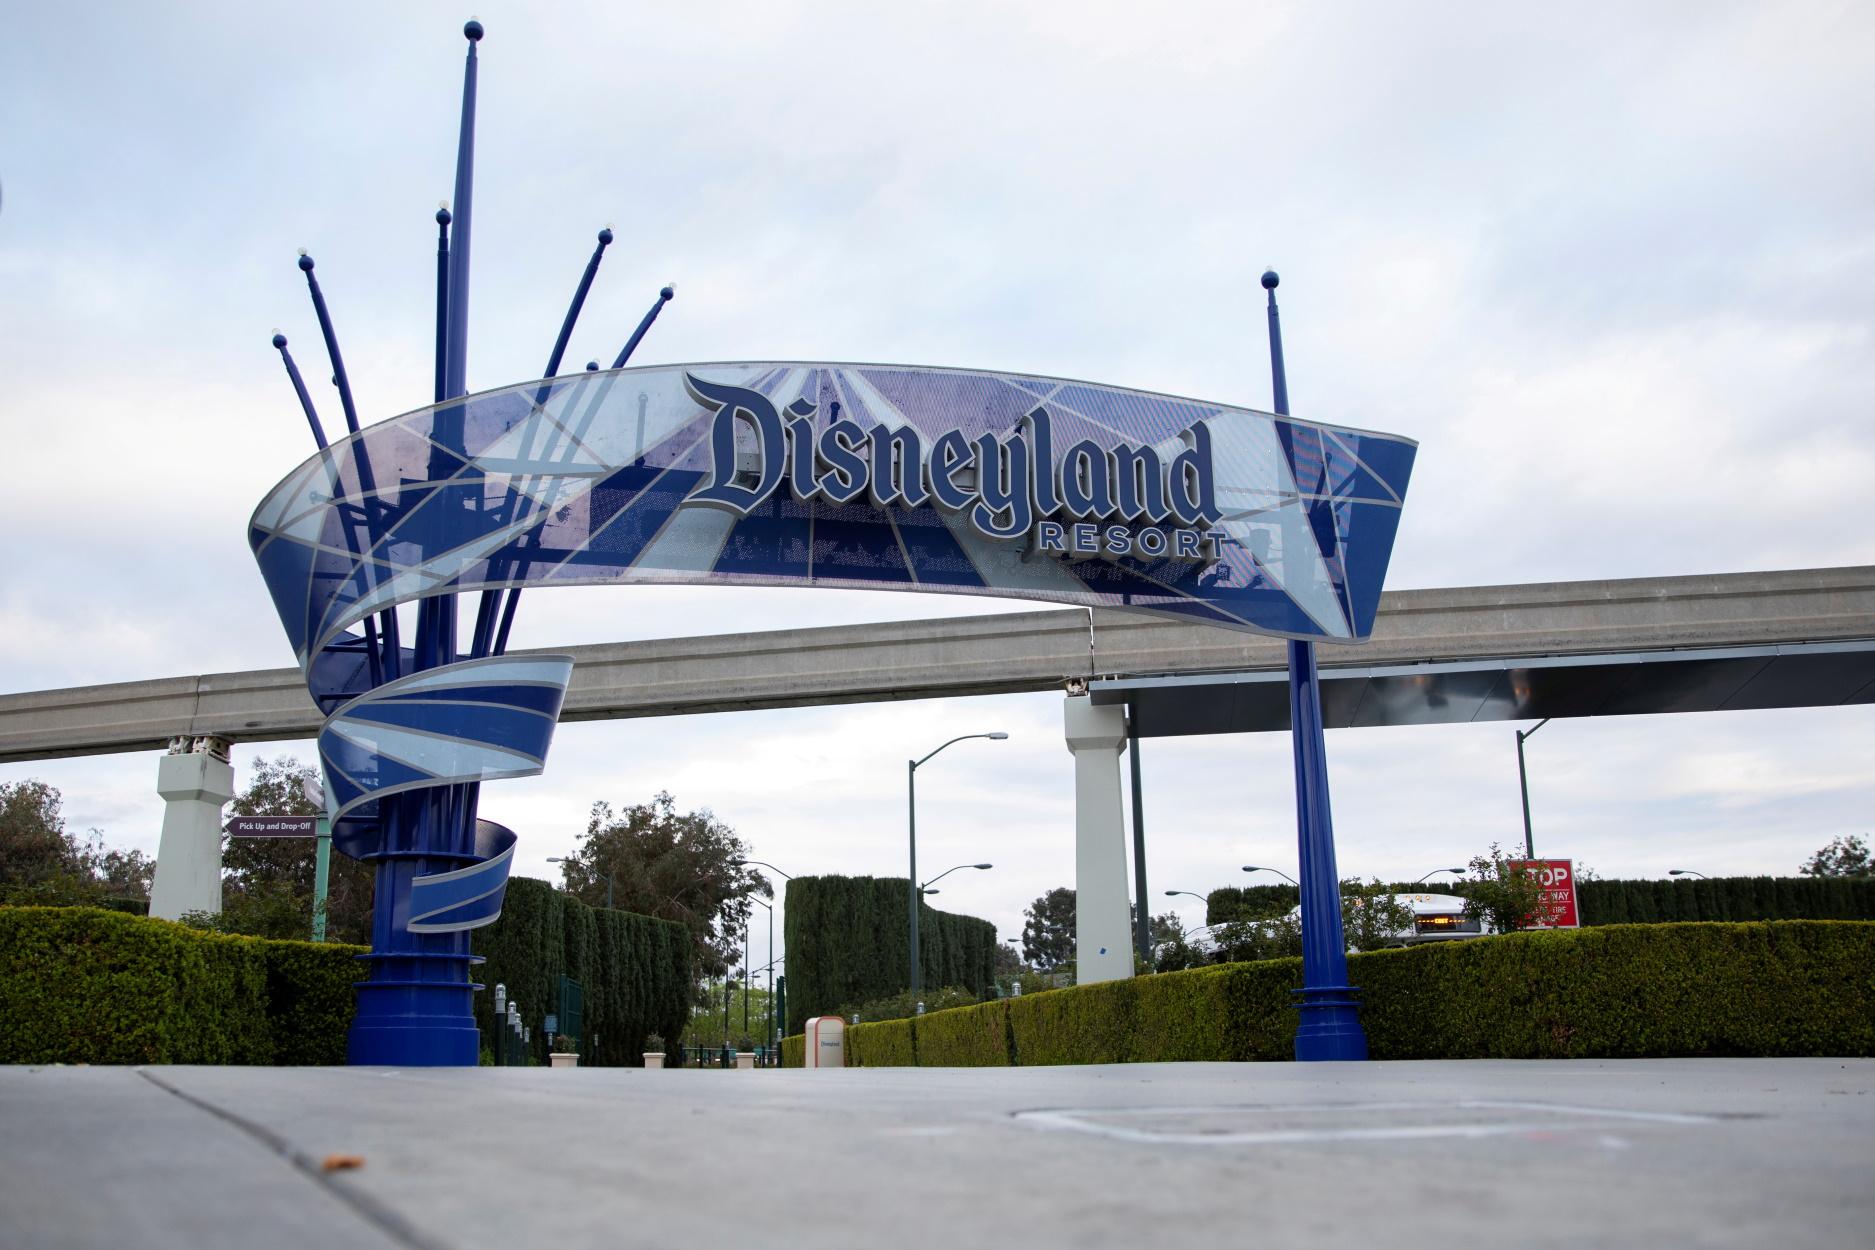 Disney: Απώλειες ύψους 1,4 δισ. δολαρίων εξαιτίας του παγκόσμιου lockdown